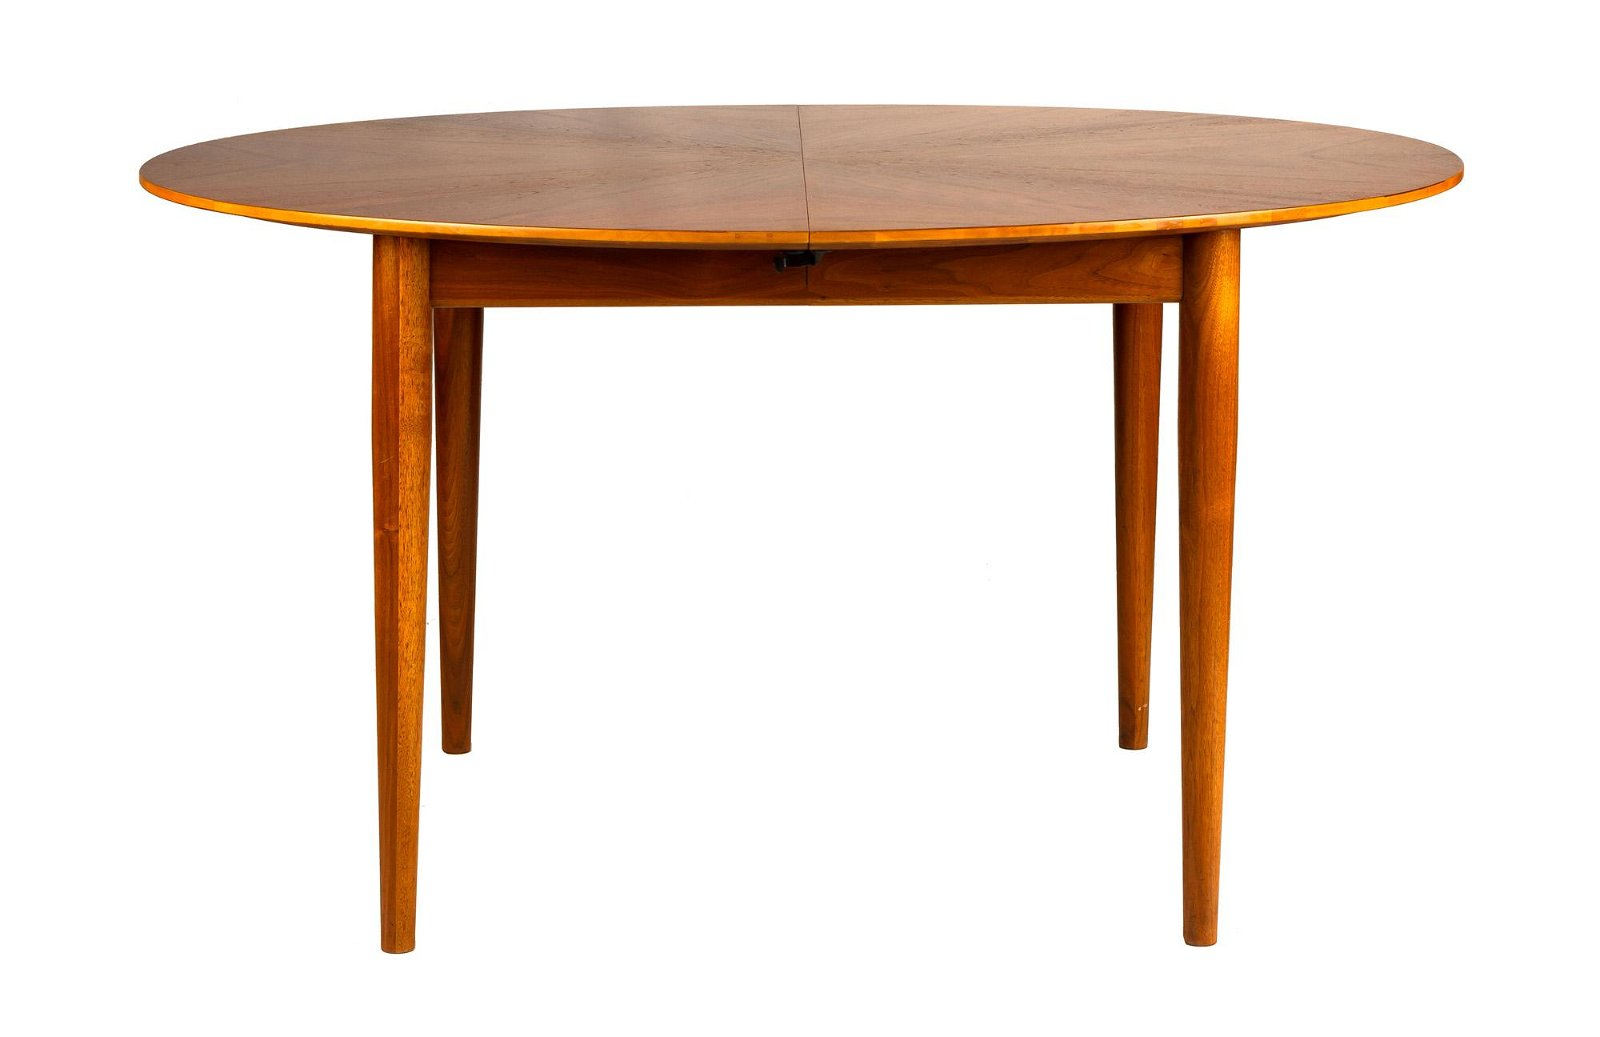 Finn Juhl (Danish, 1912-1989) Dining Table